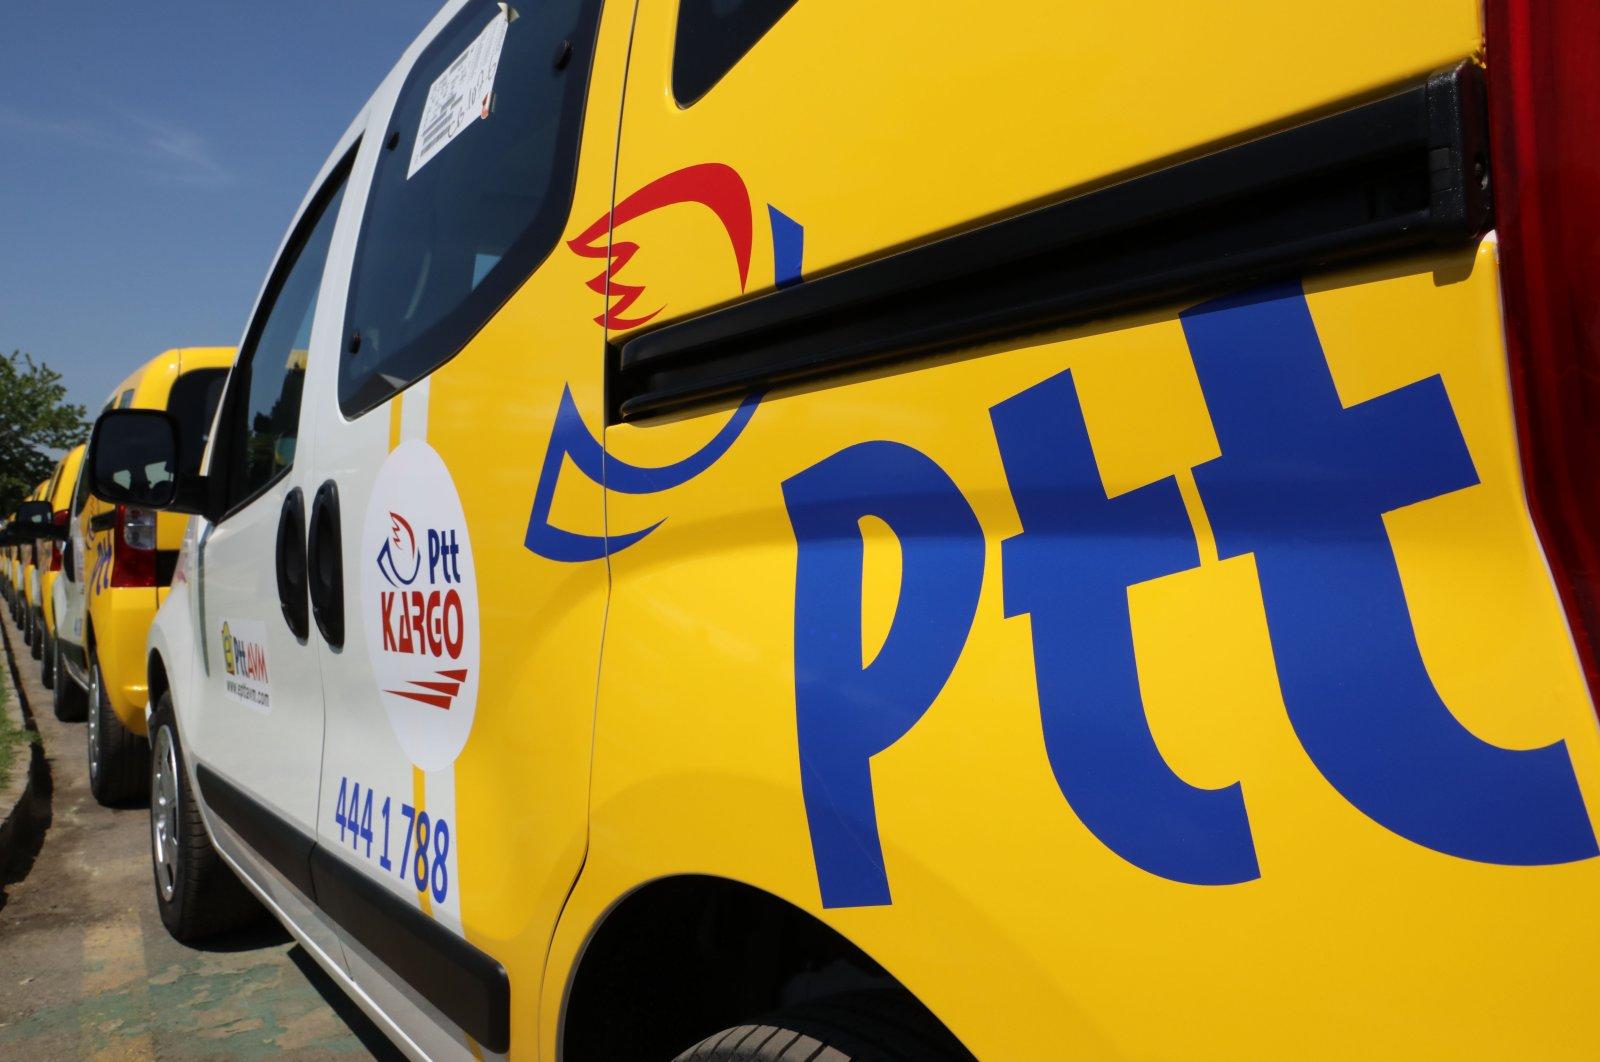 The PTT's logo is seen on a car at Tofaş Fiat automotive factory in Bursa, Turkey, April 29, 2018. (AA Photo)